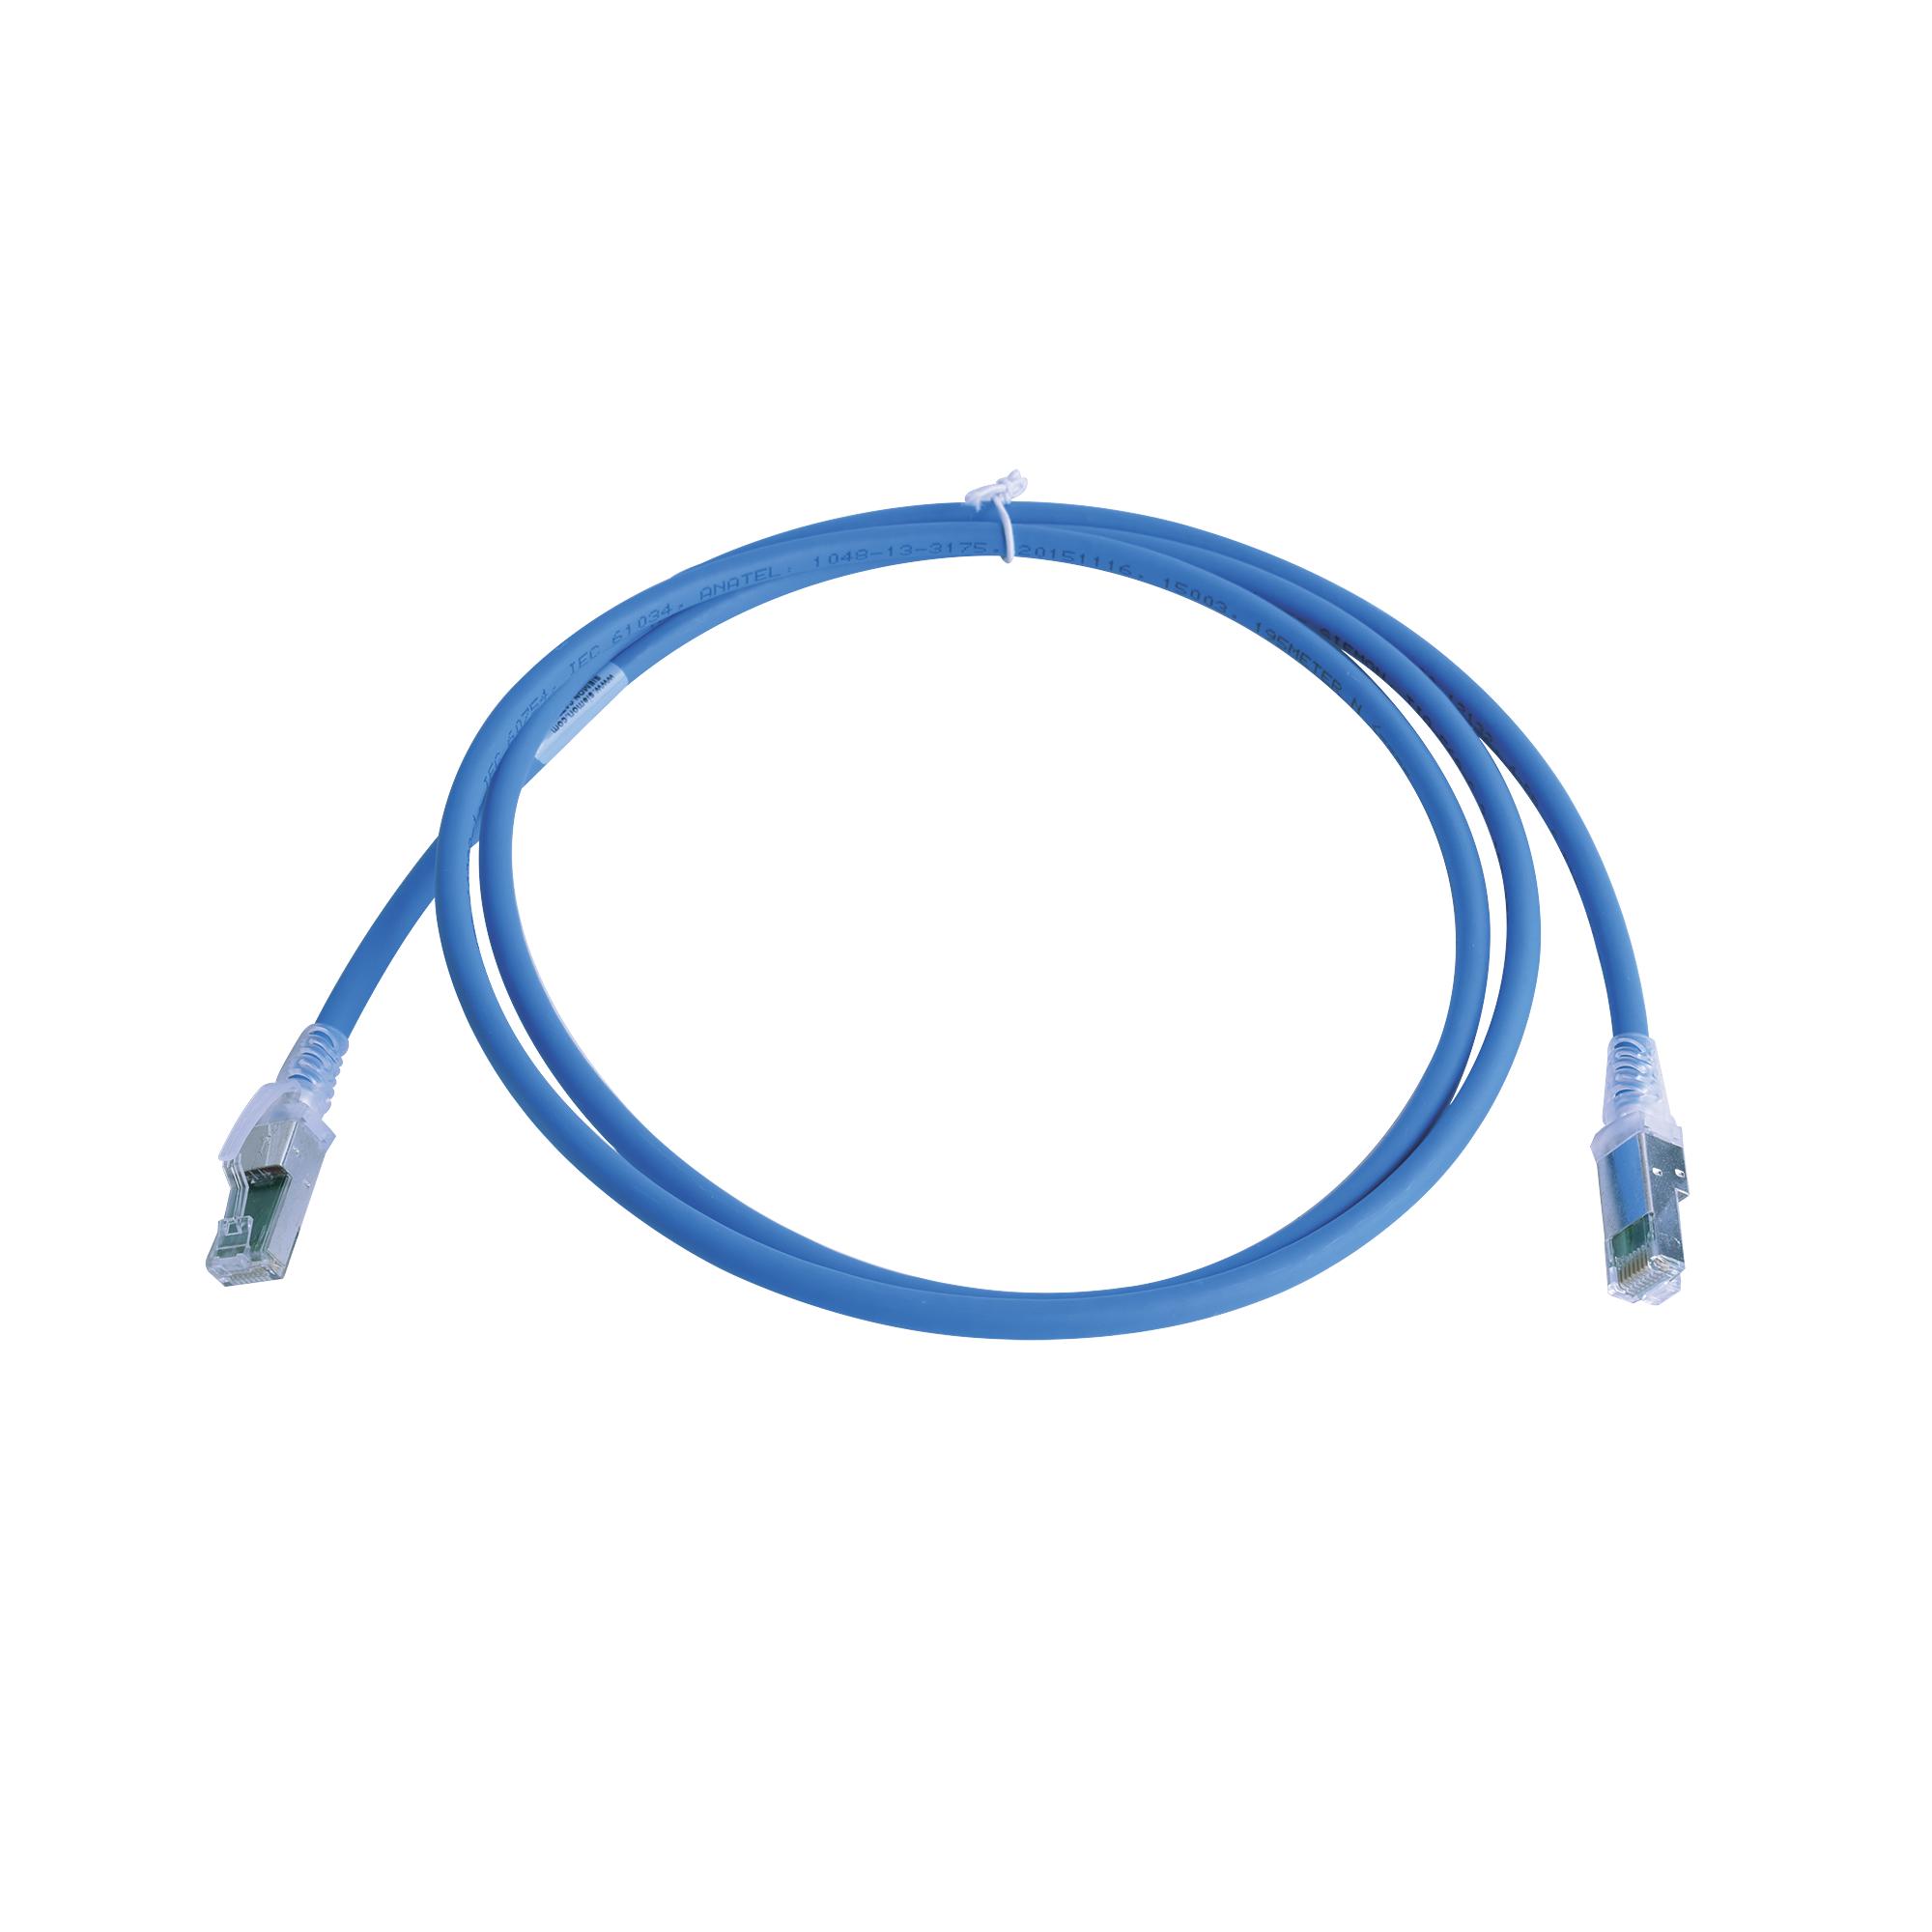 Patch Cord Z-MAX Cat6A S/FTP, CM/LS0H, 5ft, Color Azul, Version Bulk (Sin Empaque Individual)